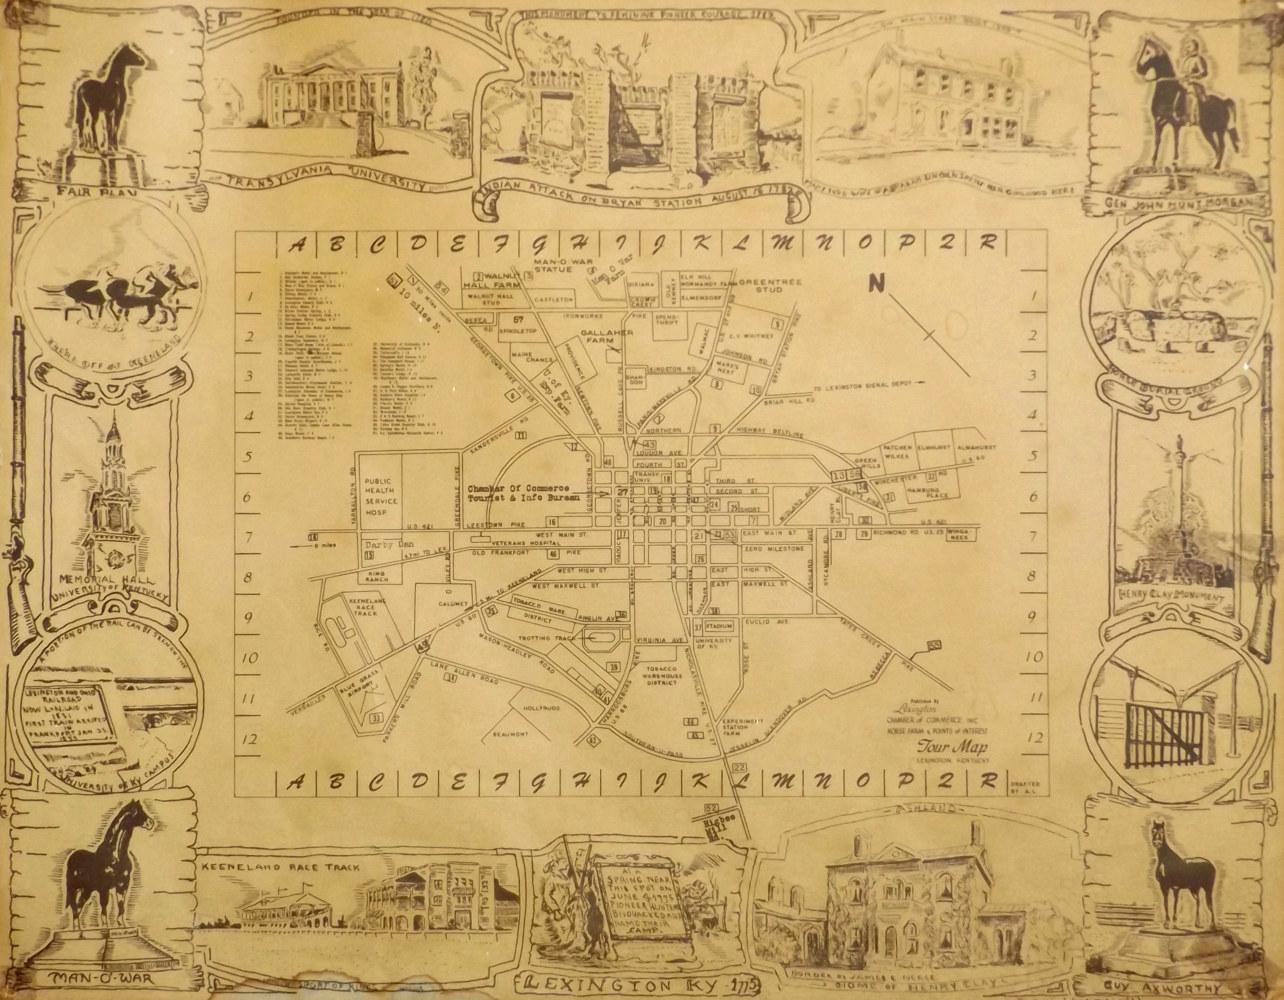 1950s Map of Lexington Kentucky David Neace Artist